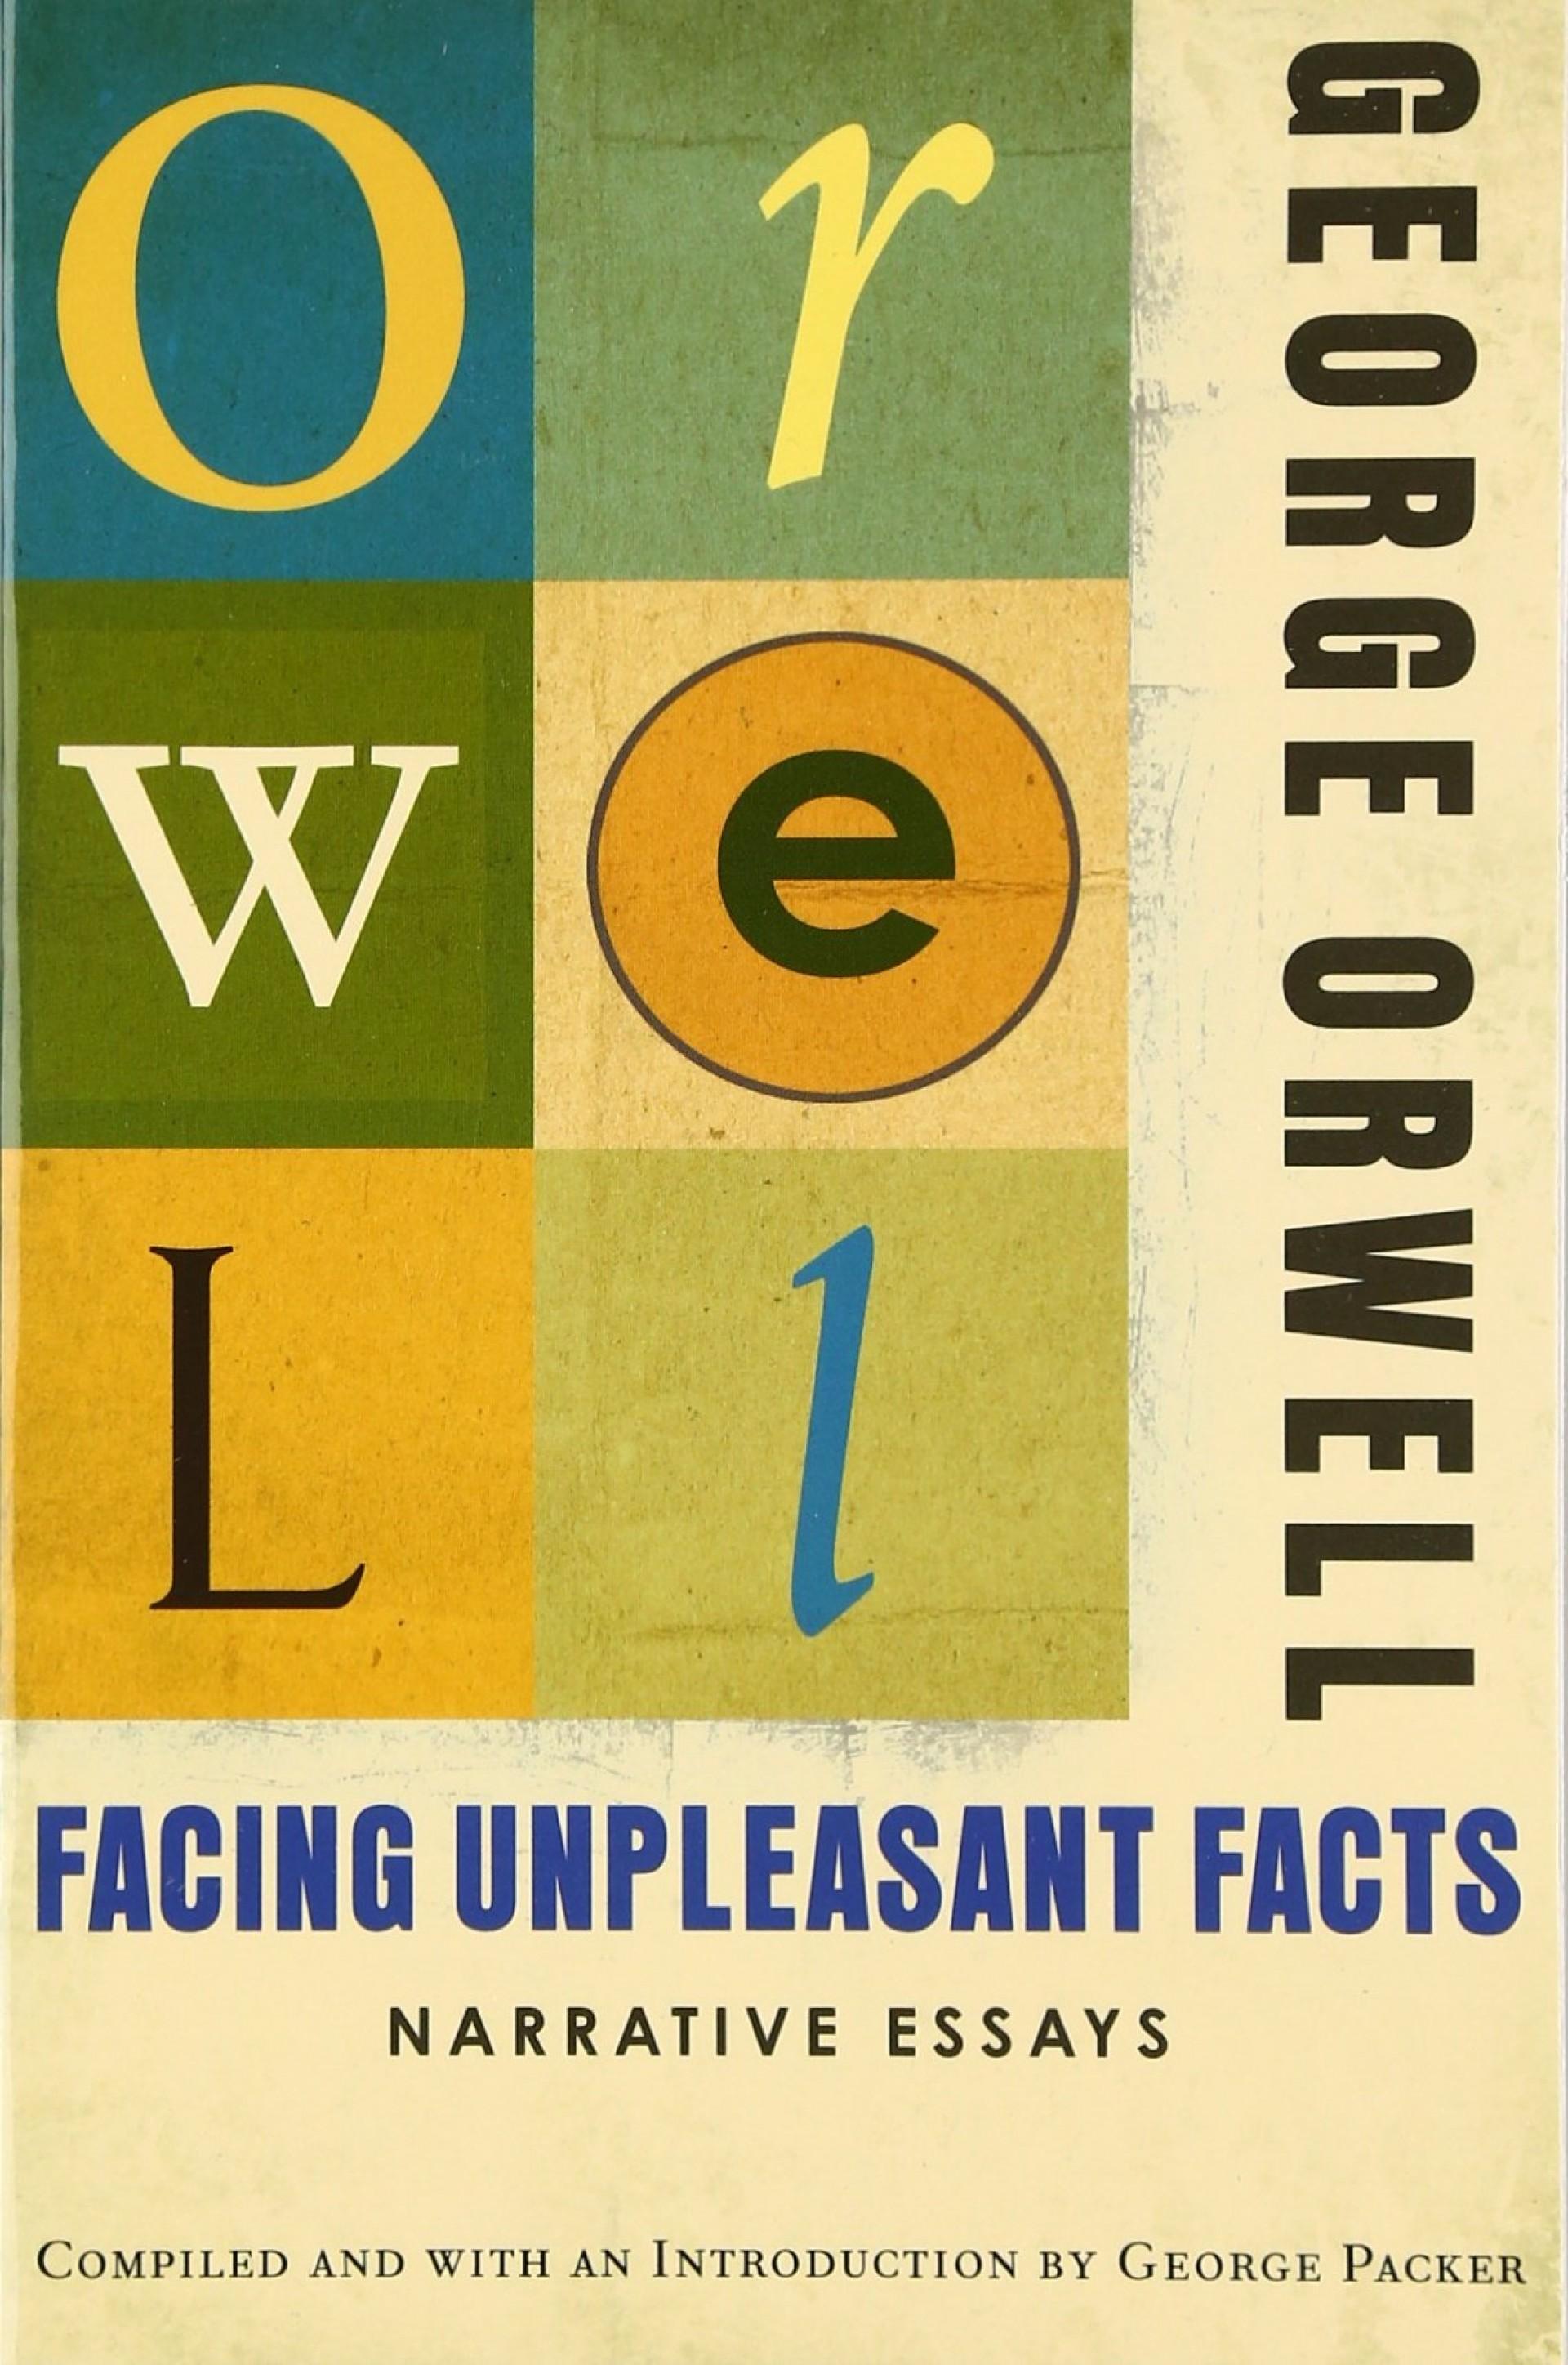 023 Essay Example 817mi1ypesl George Orwell Frightening Essays Everyman's Library Summary Bookshop Memories 1920